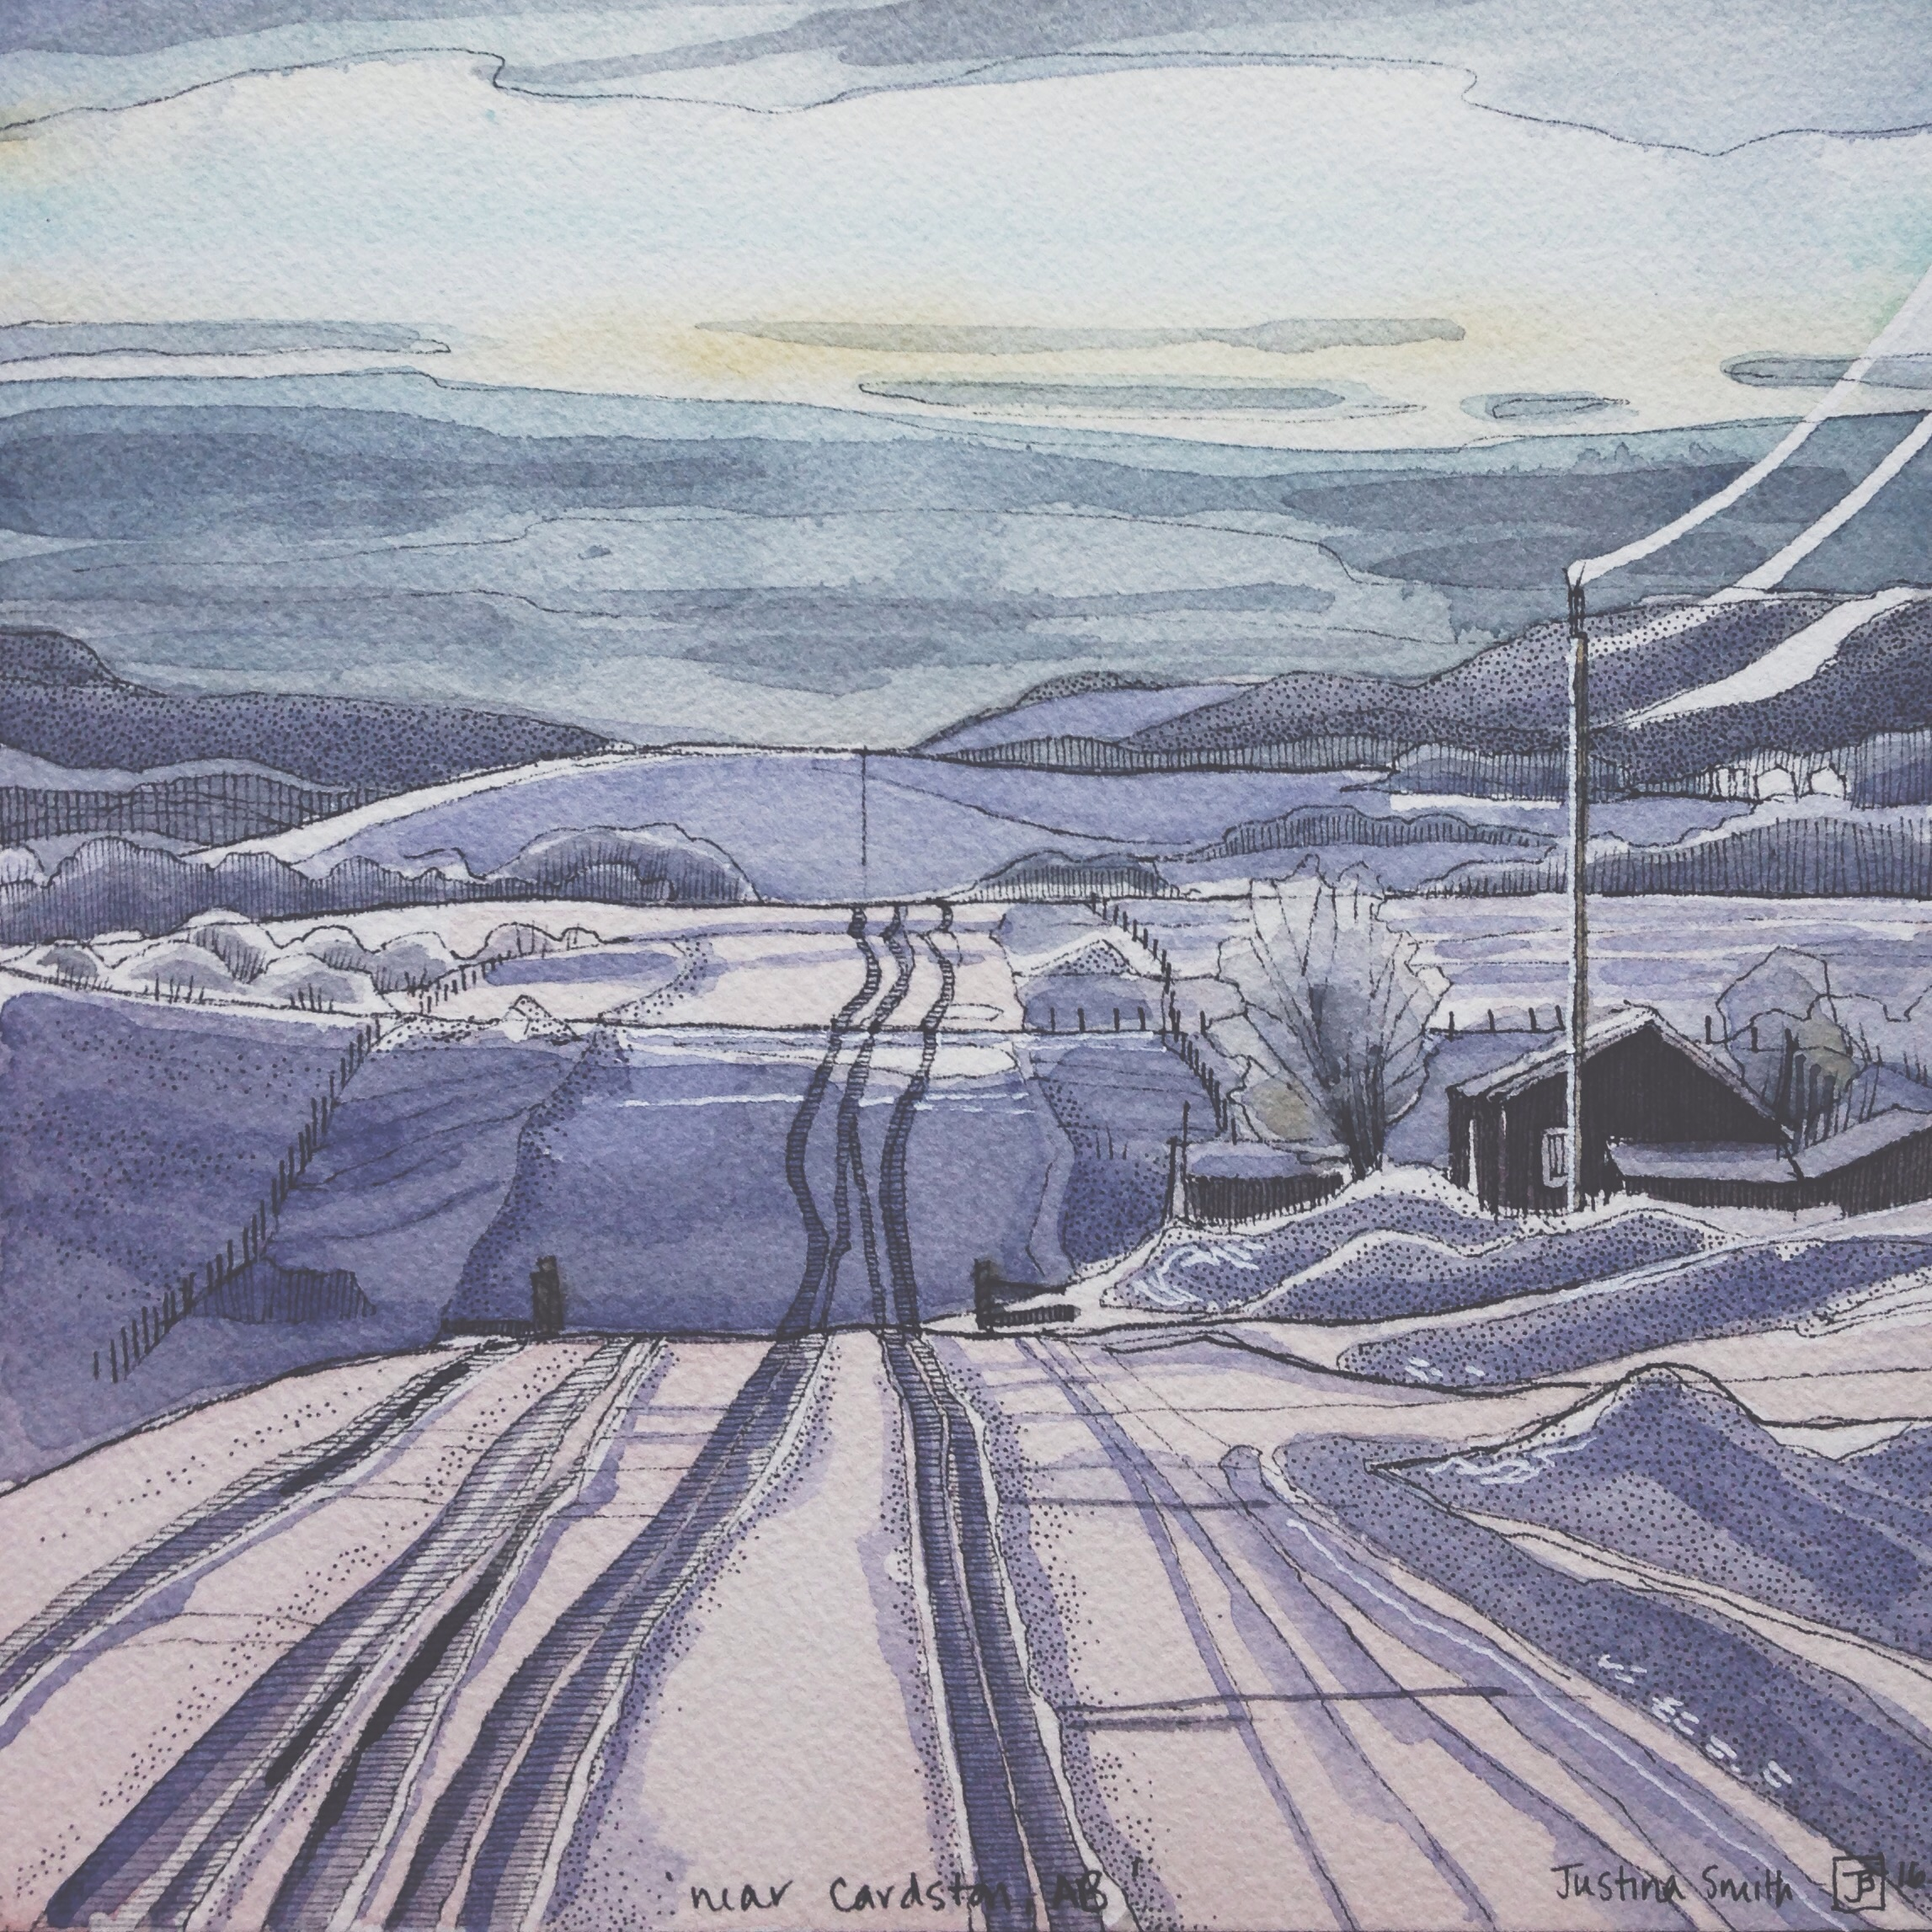 near Cardston Alberta, pen & watercolour on cold pressed paper, 8x8(in), SOLD, 2016